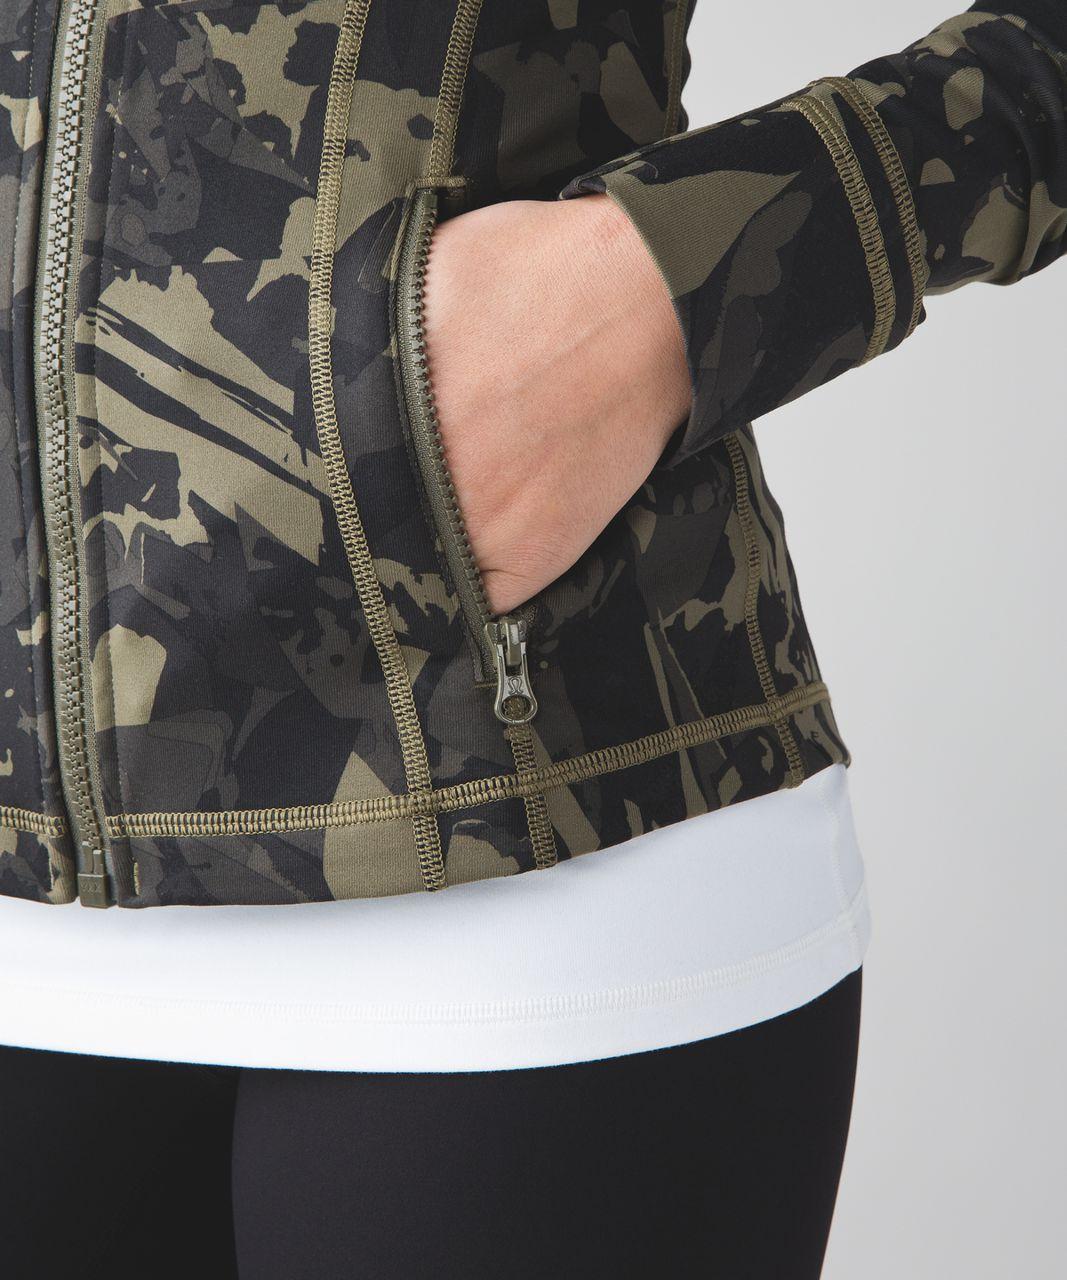 Lululemon Define Jacket - Pop Cut Fatigue Green Black